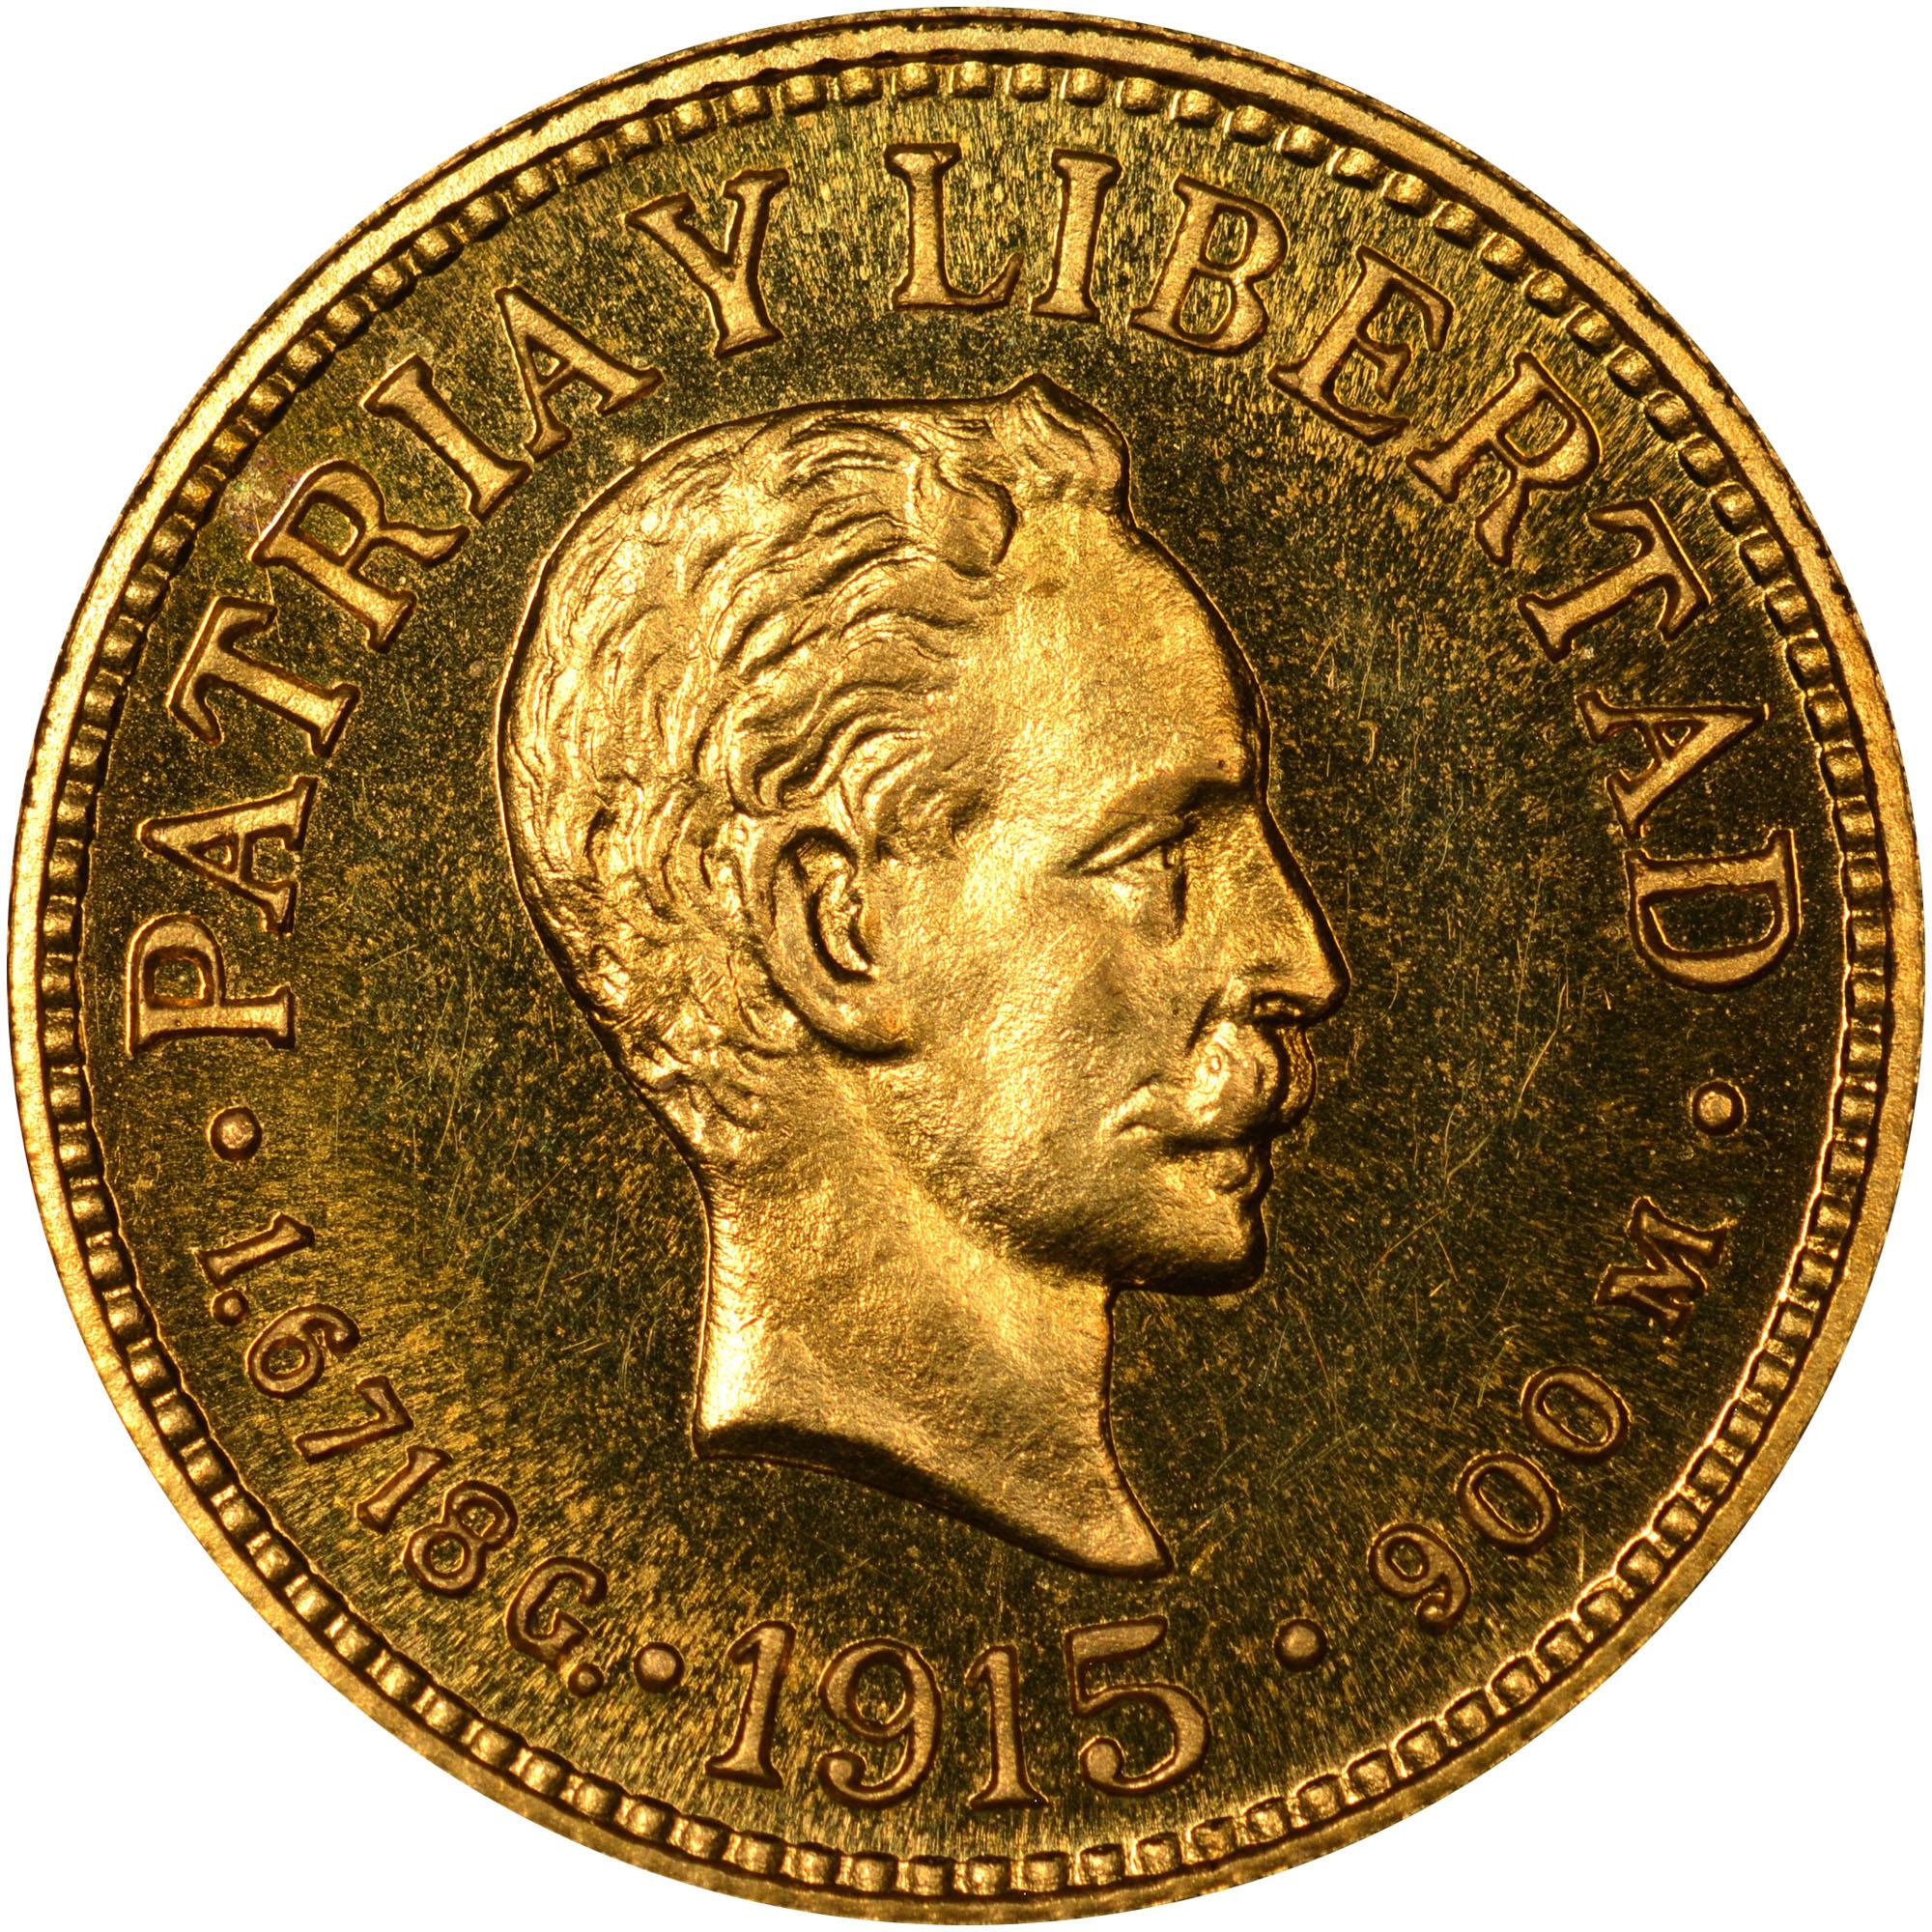 1915-1916 Cuba Peso obverse